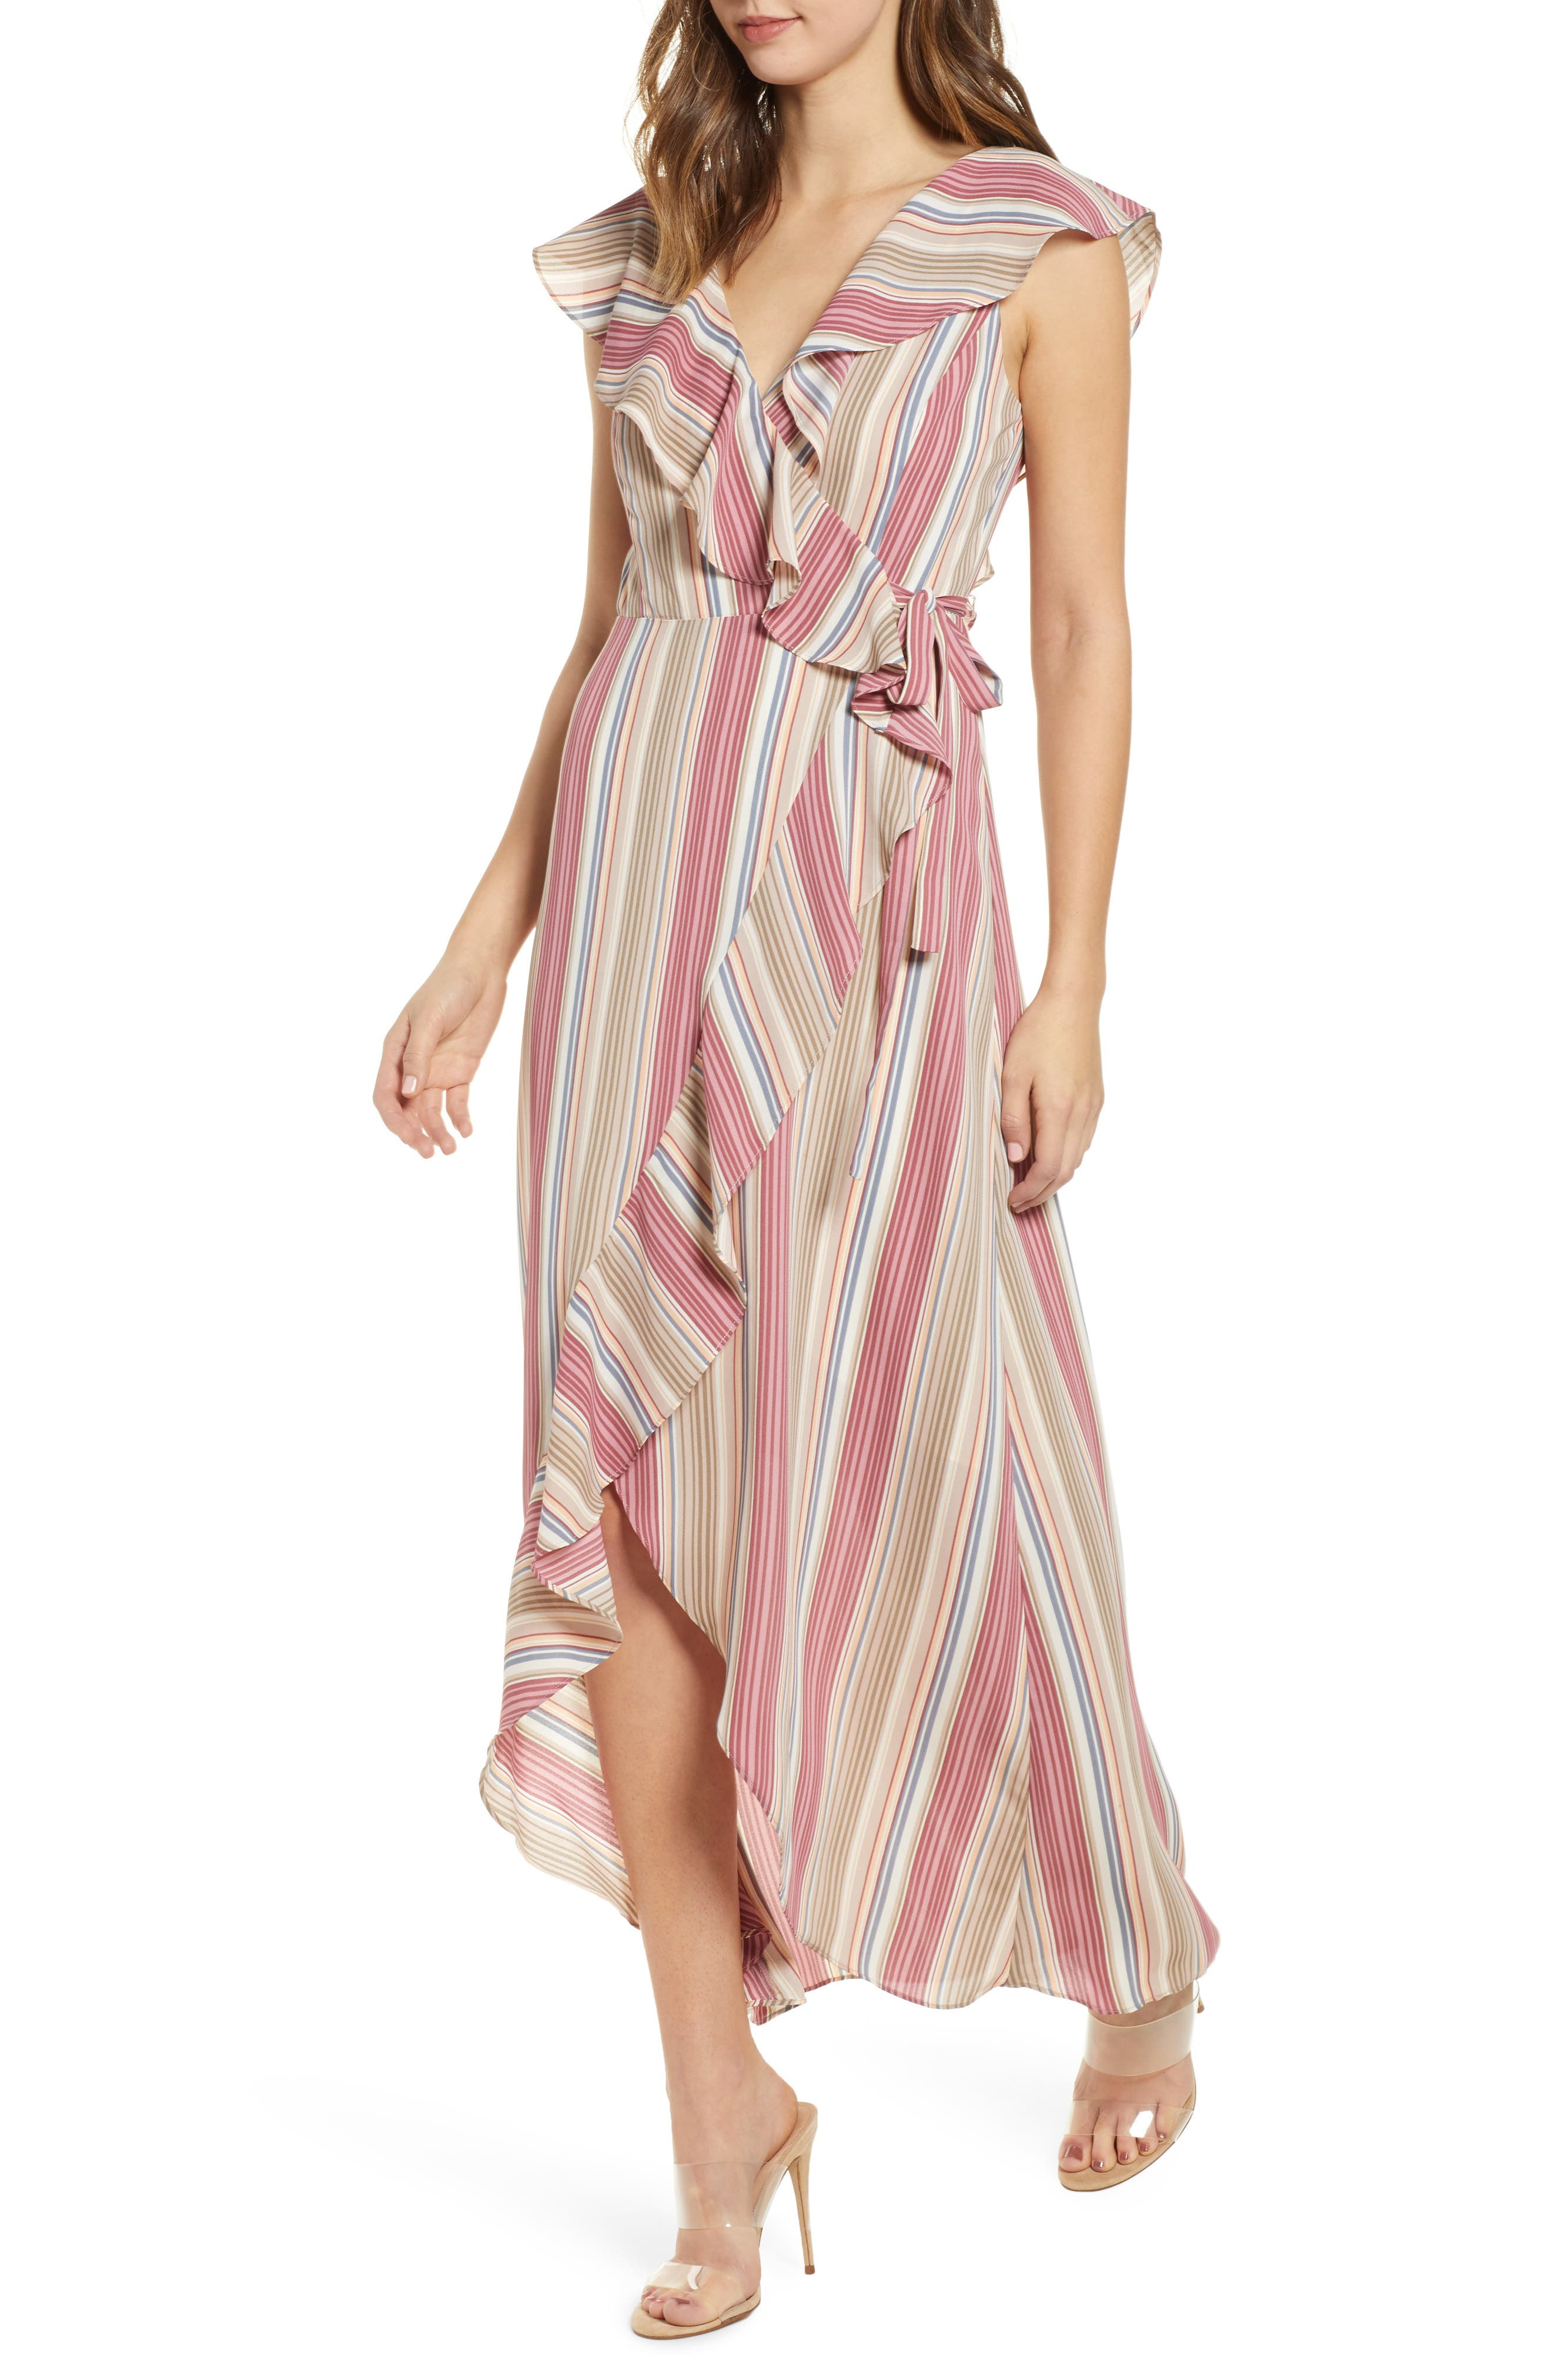 LEITH Ruffle Wrap Maxi Dress, Main, color, PINK CANYON TONAL STRIPE